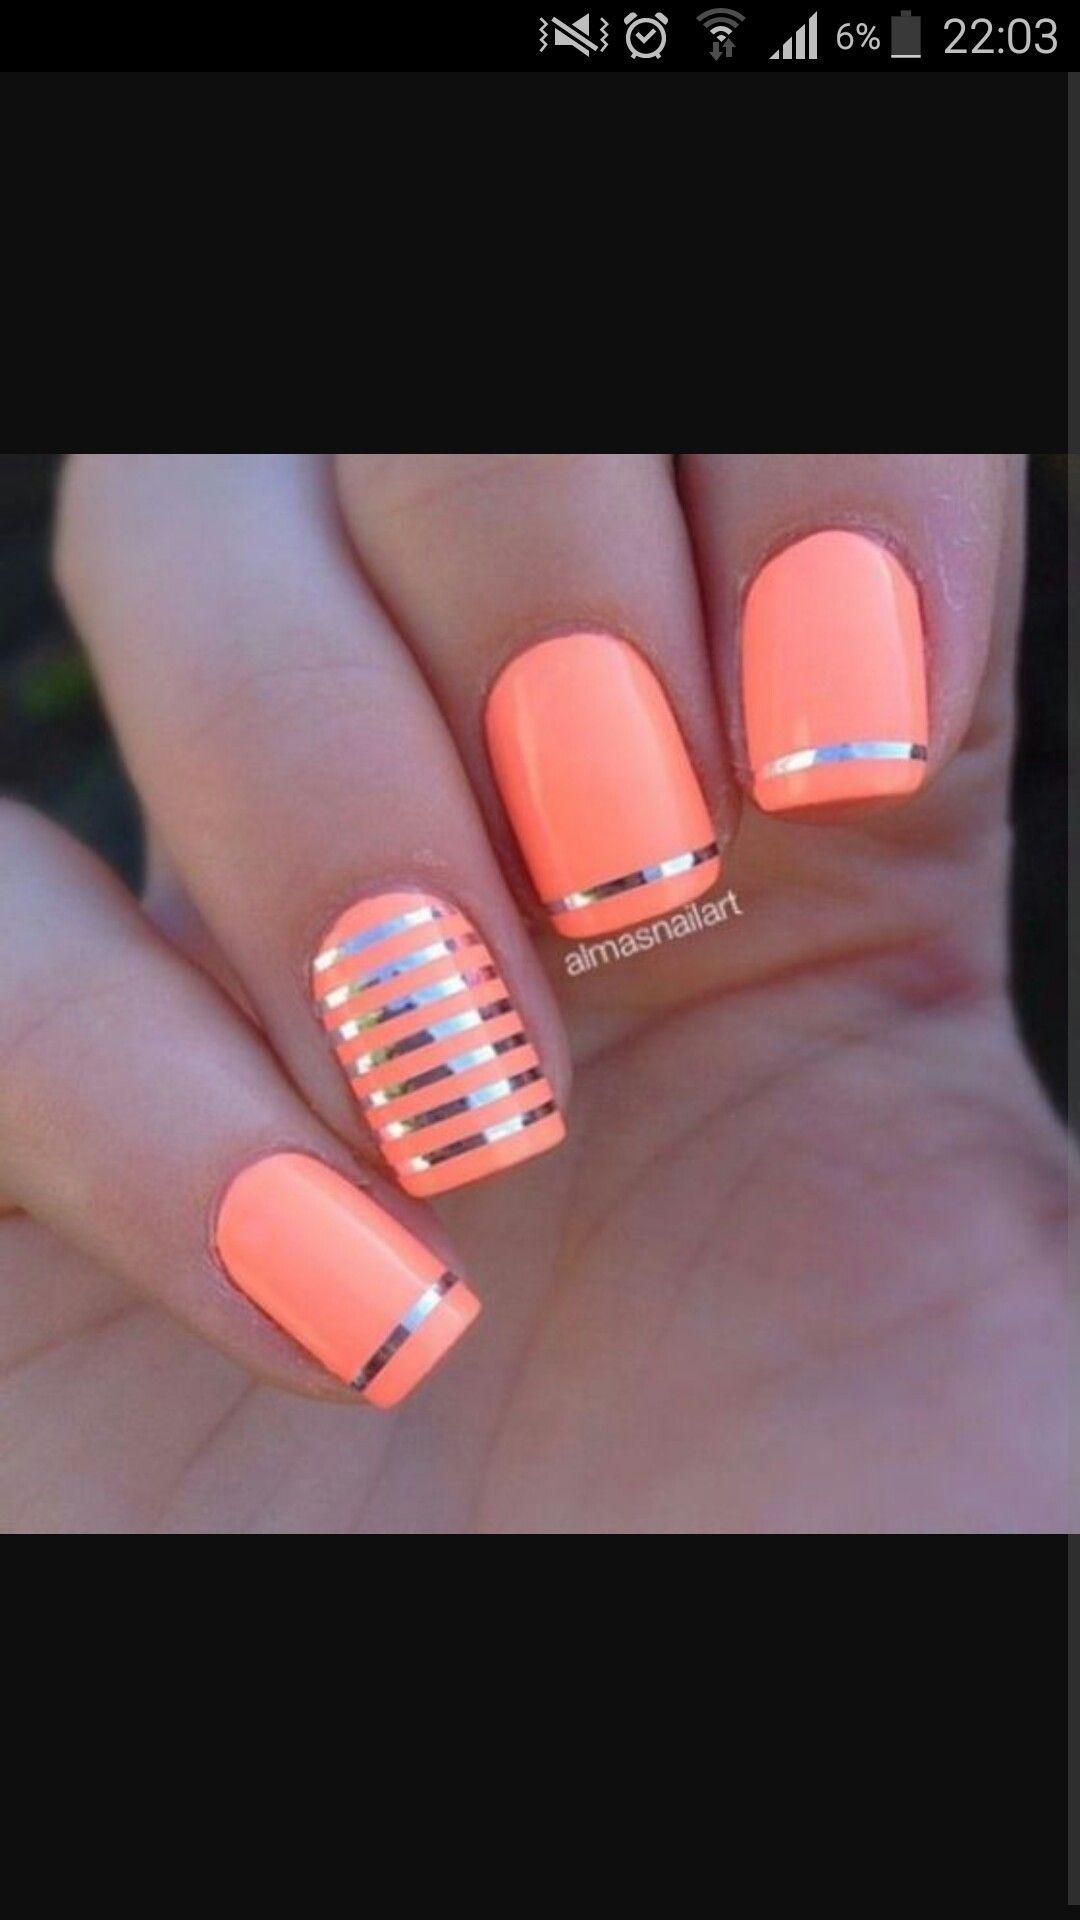 Pin by Simina Costinas on NailArt | Pinterest | Manicure and Makeup